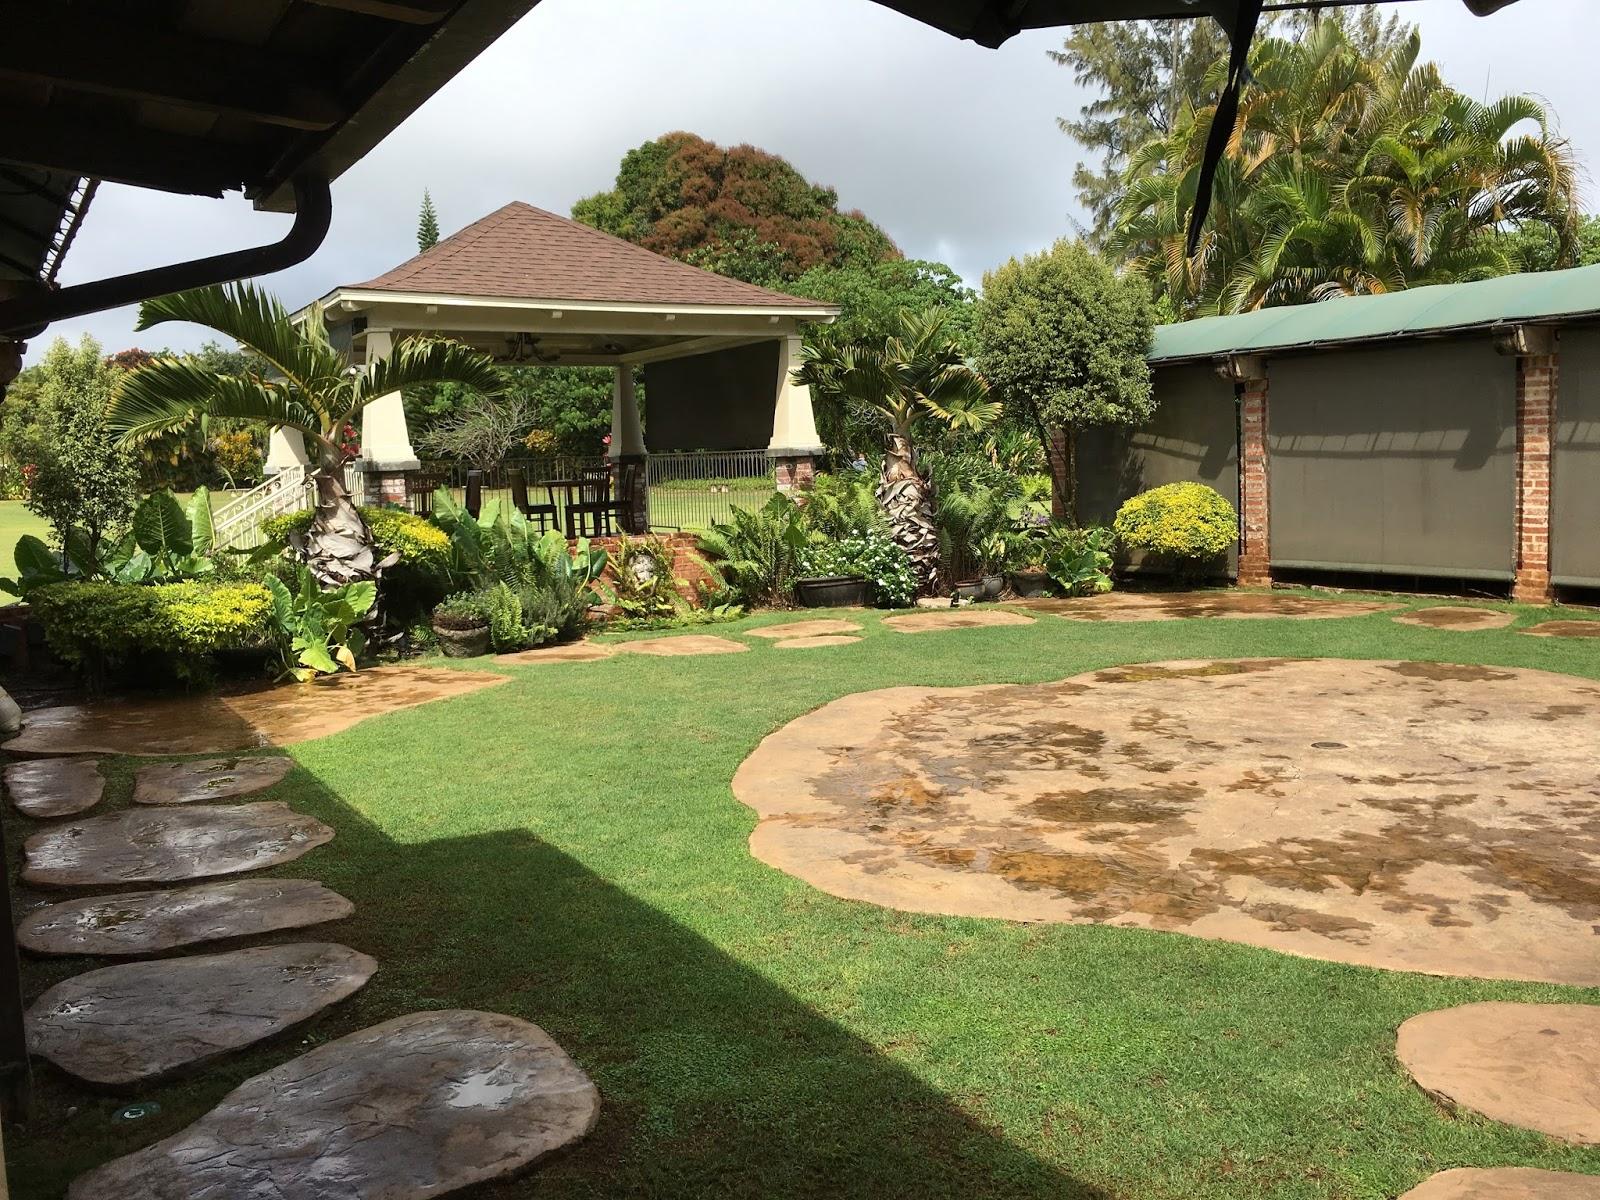 TASTE OF HAWAII: GAYLORD\'S AT KILOHANA